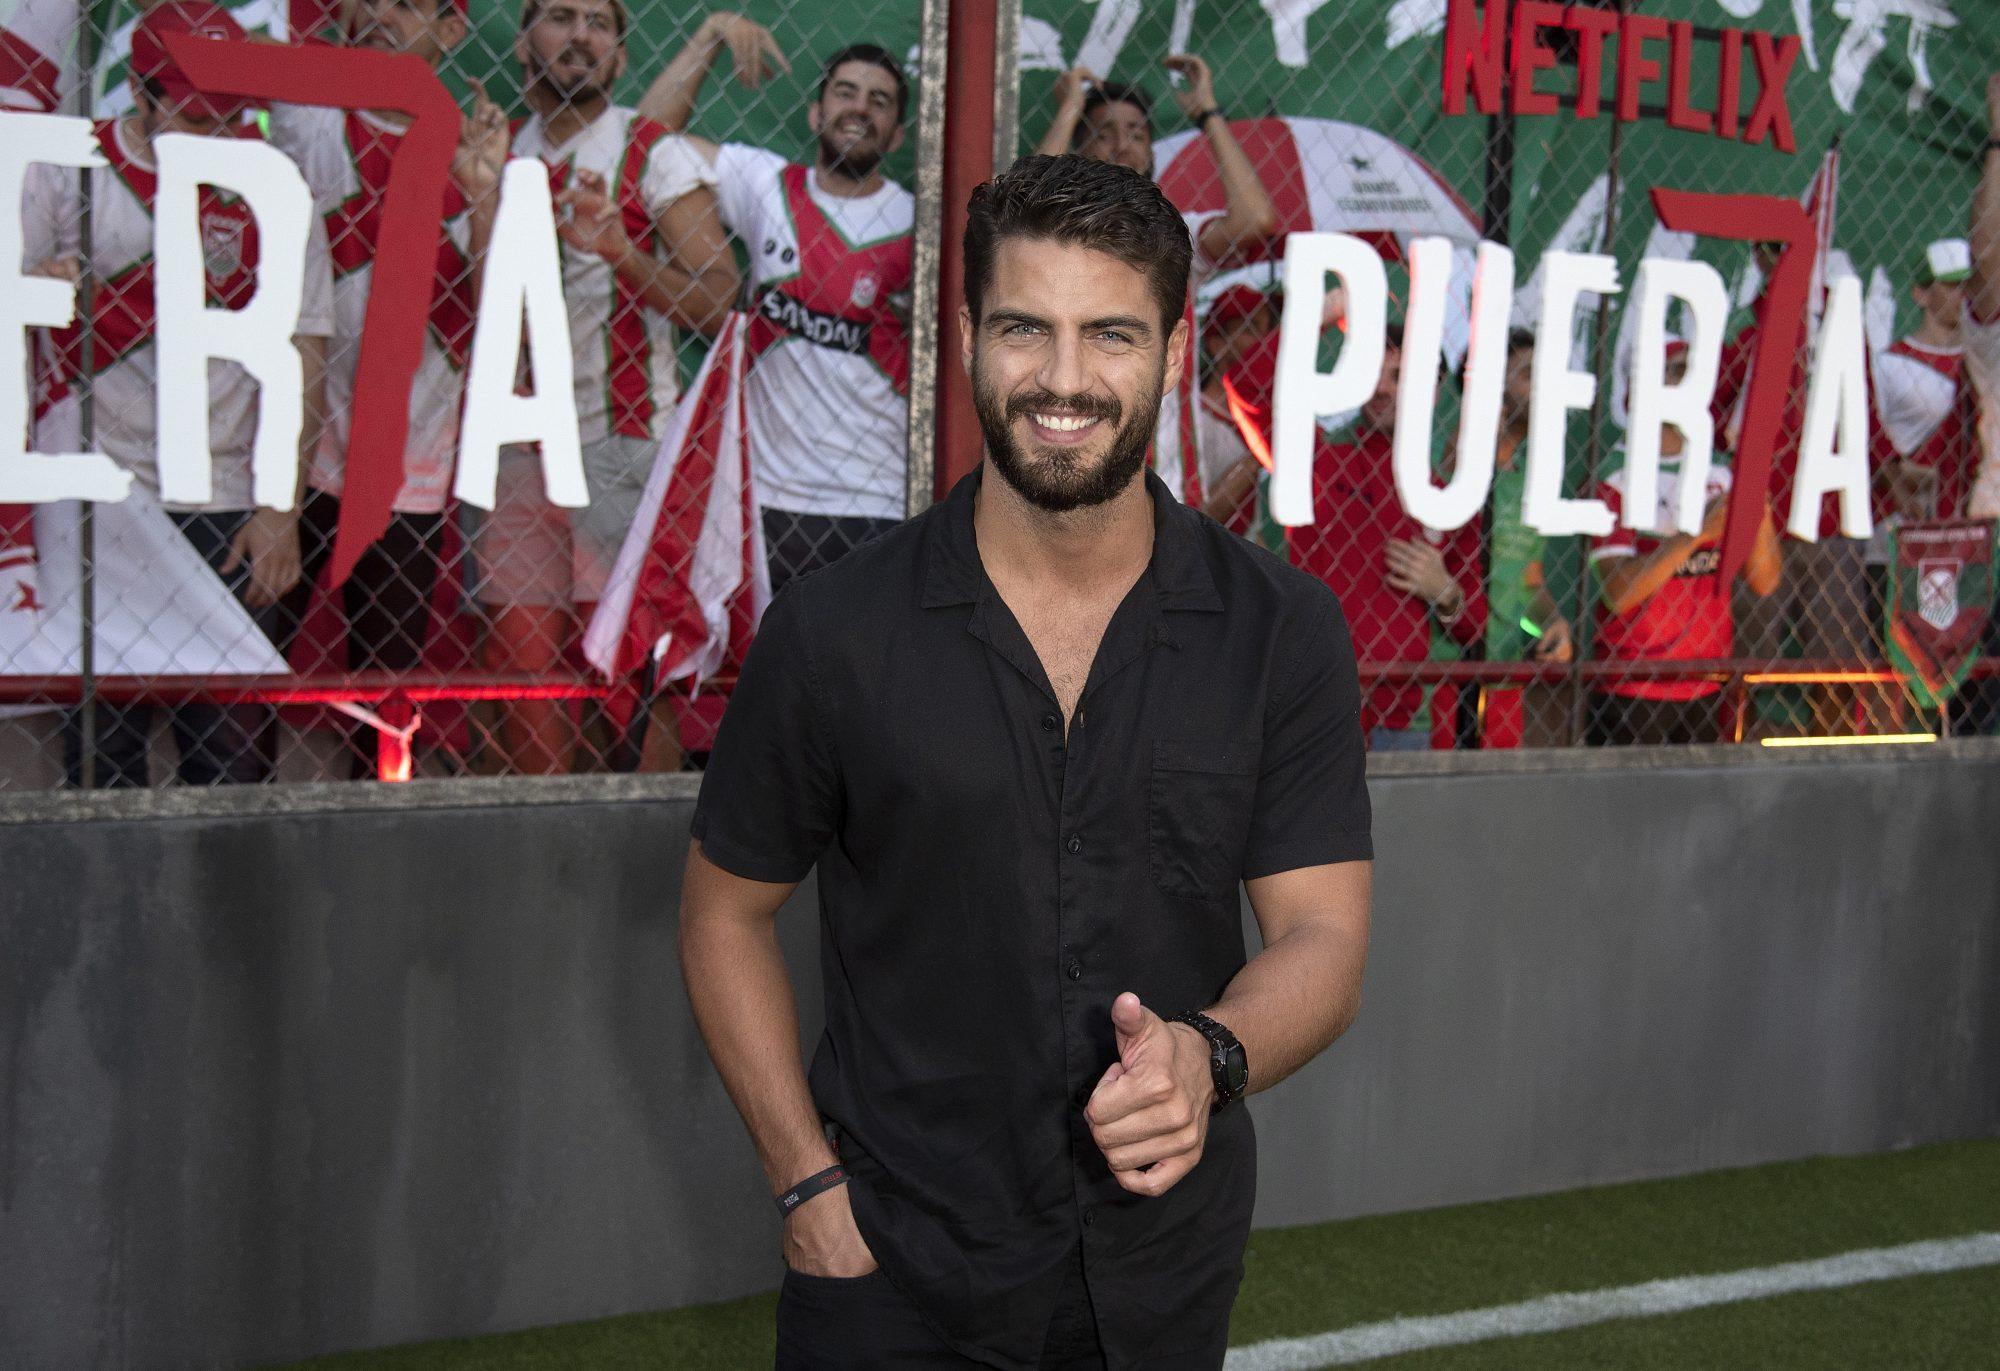 Maxi Iglesias premiere de la serie de Netflix Puerta 7, en Buenos Aires